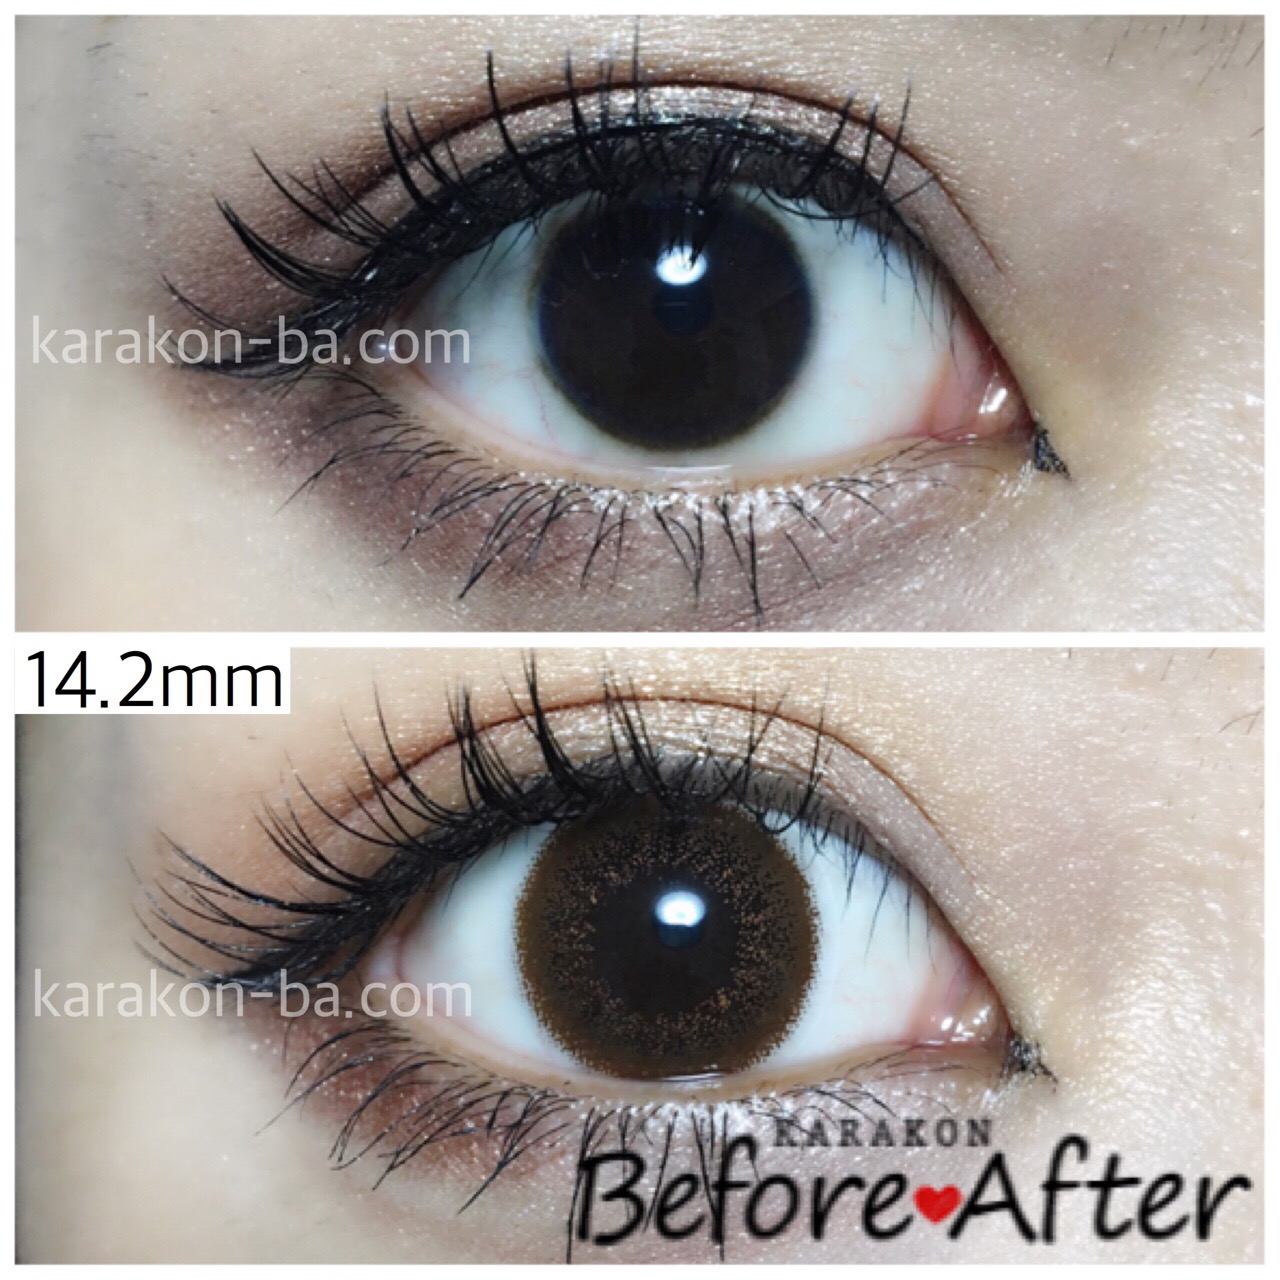 eyelist(アイリスト)チョコのカラコン装着画像/裸眼と比較レポ